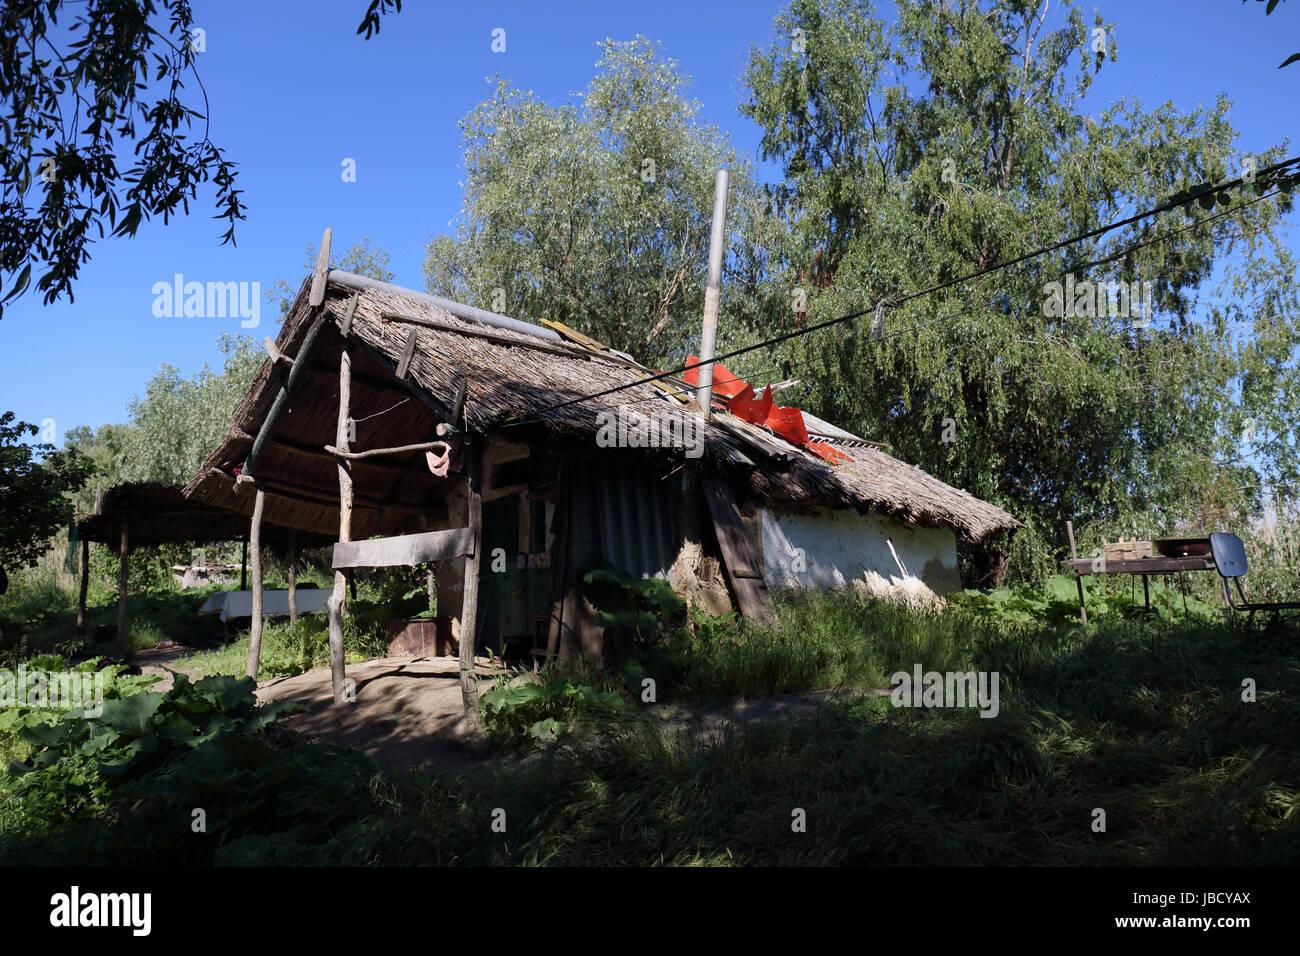 fishermans-hut-at-the-danube-river-delta